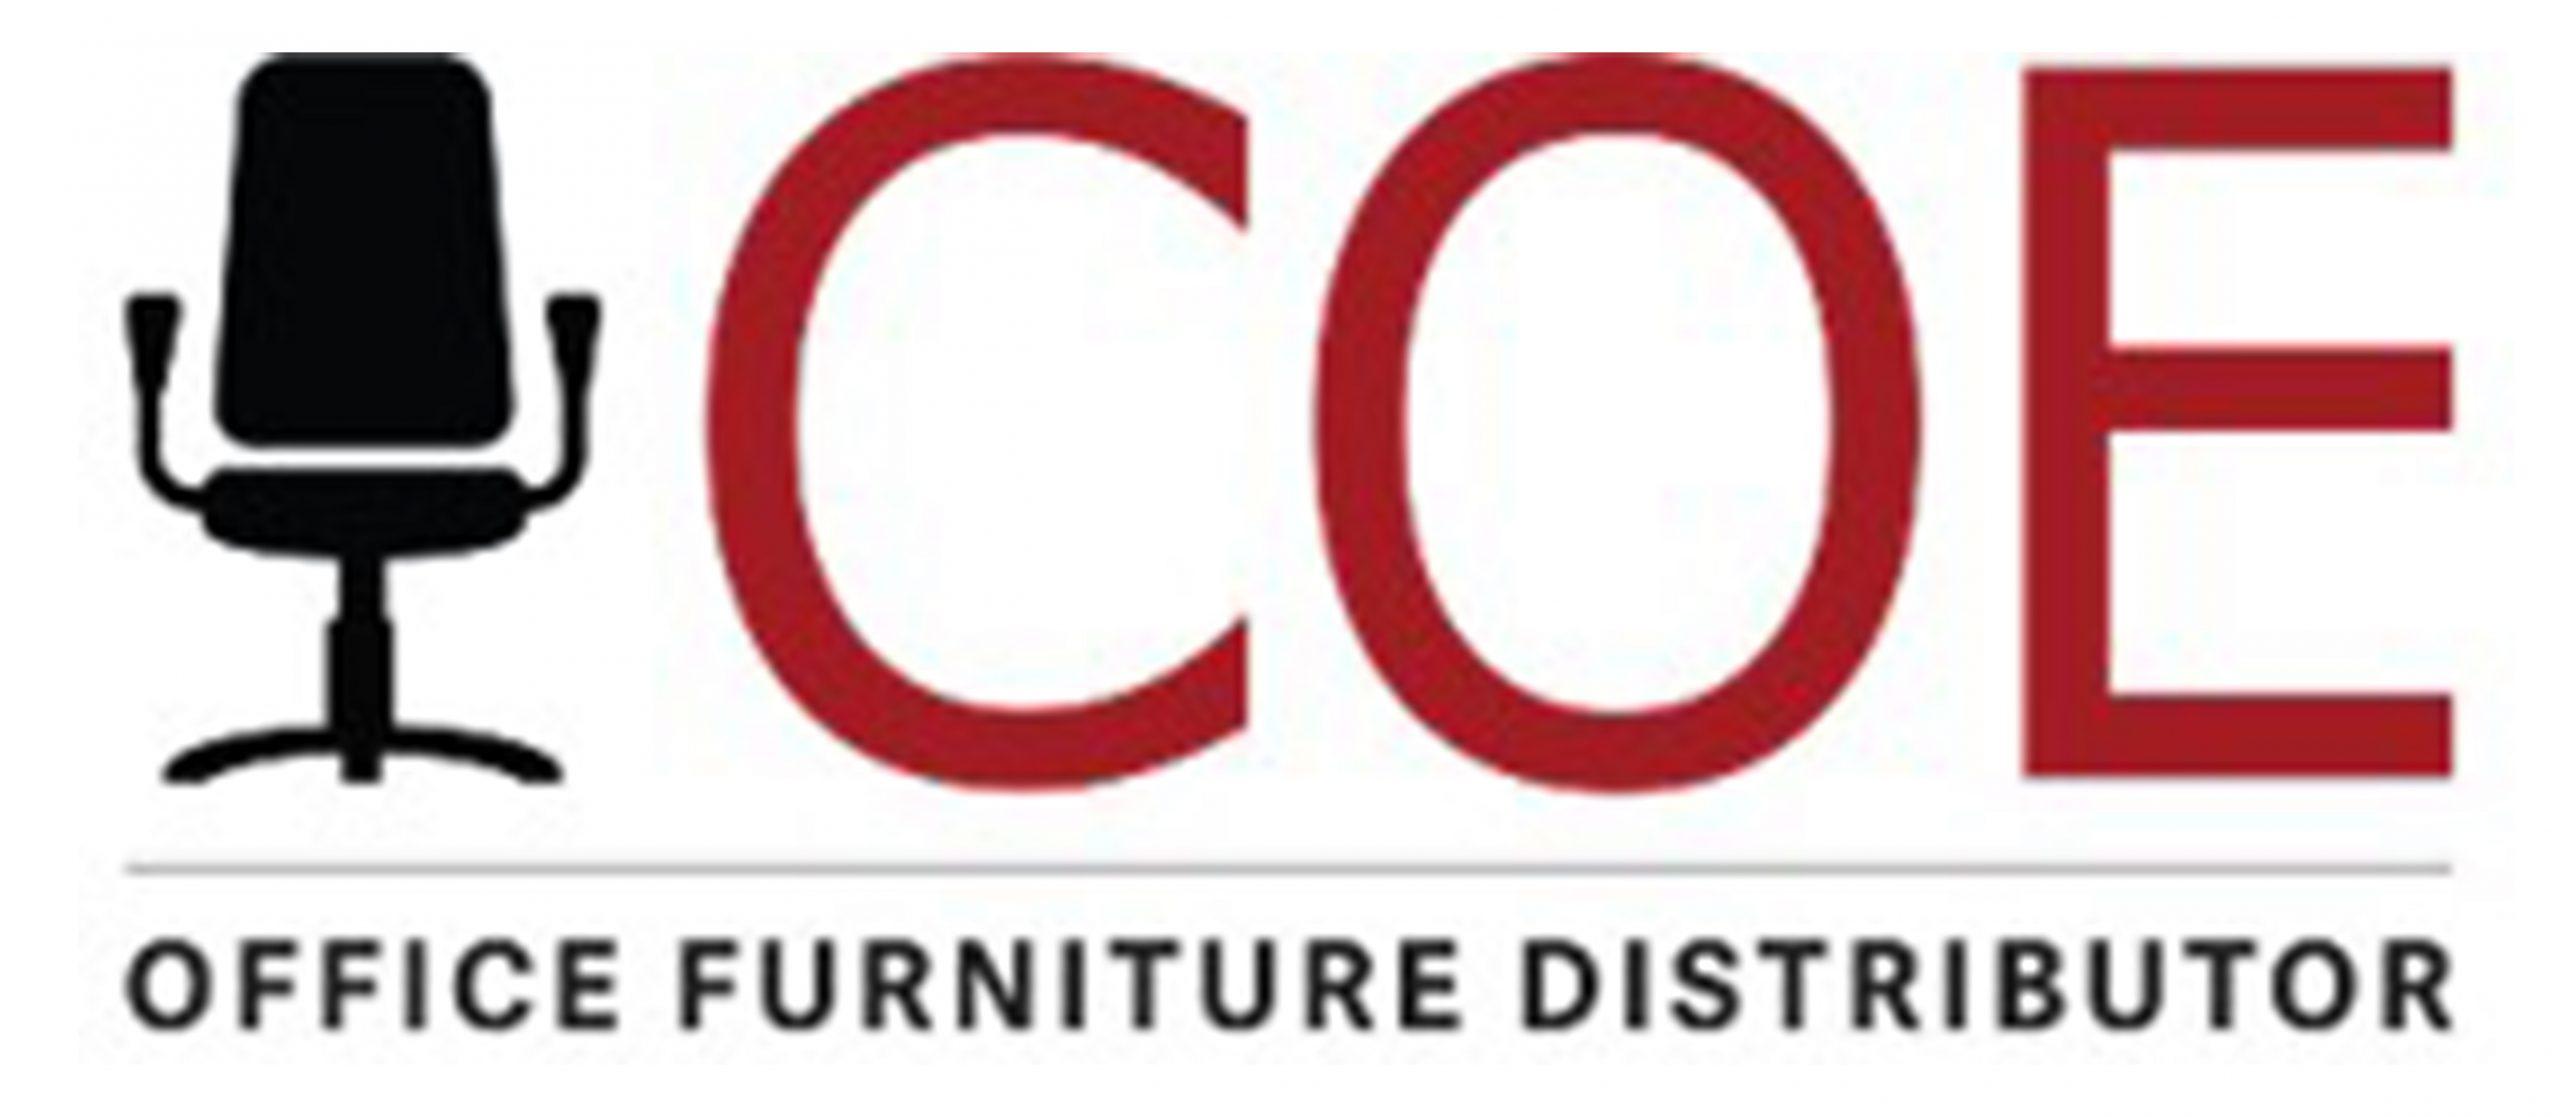 COE Distributors Logo Homepage